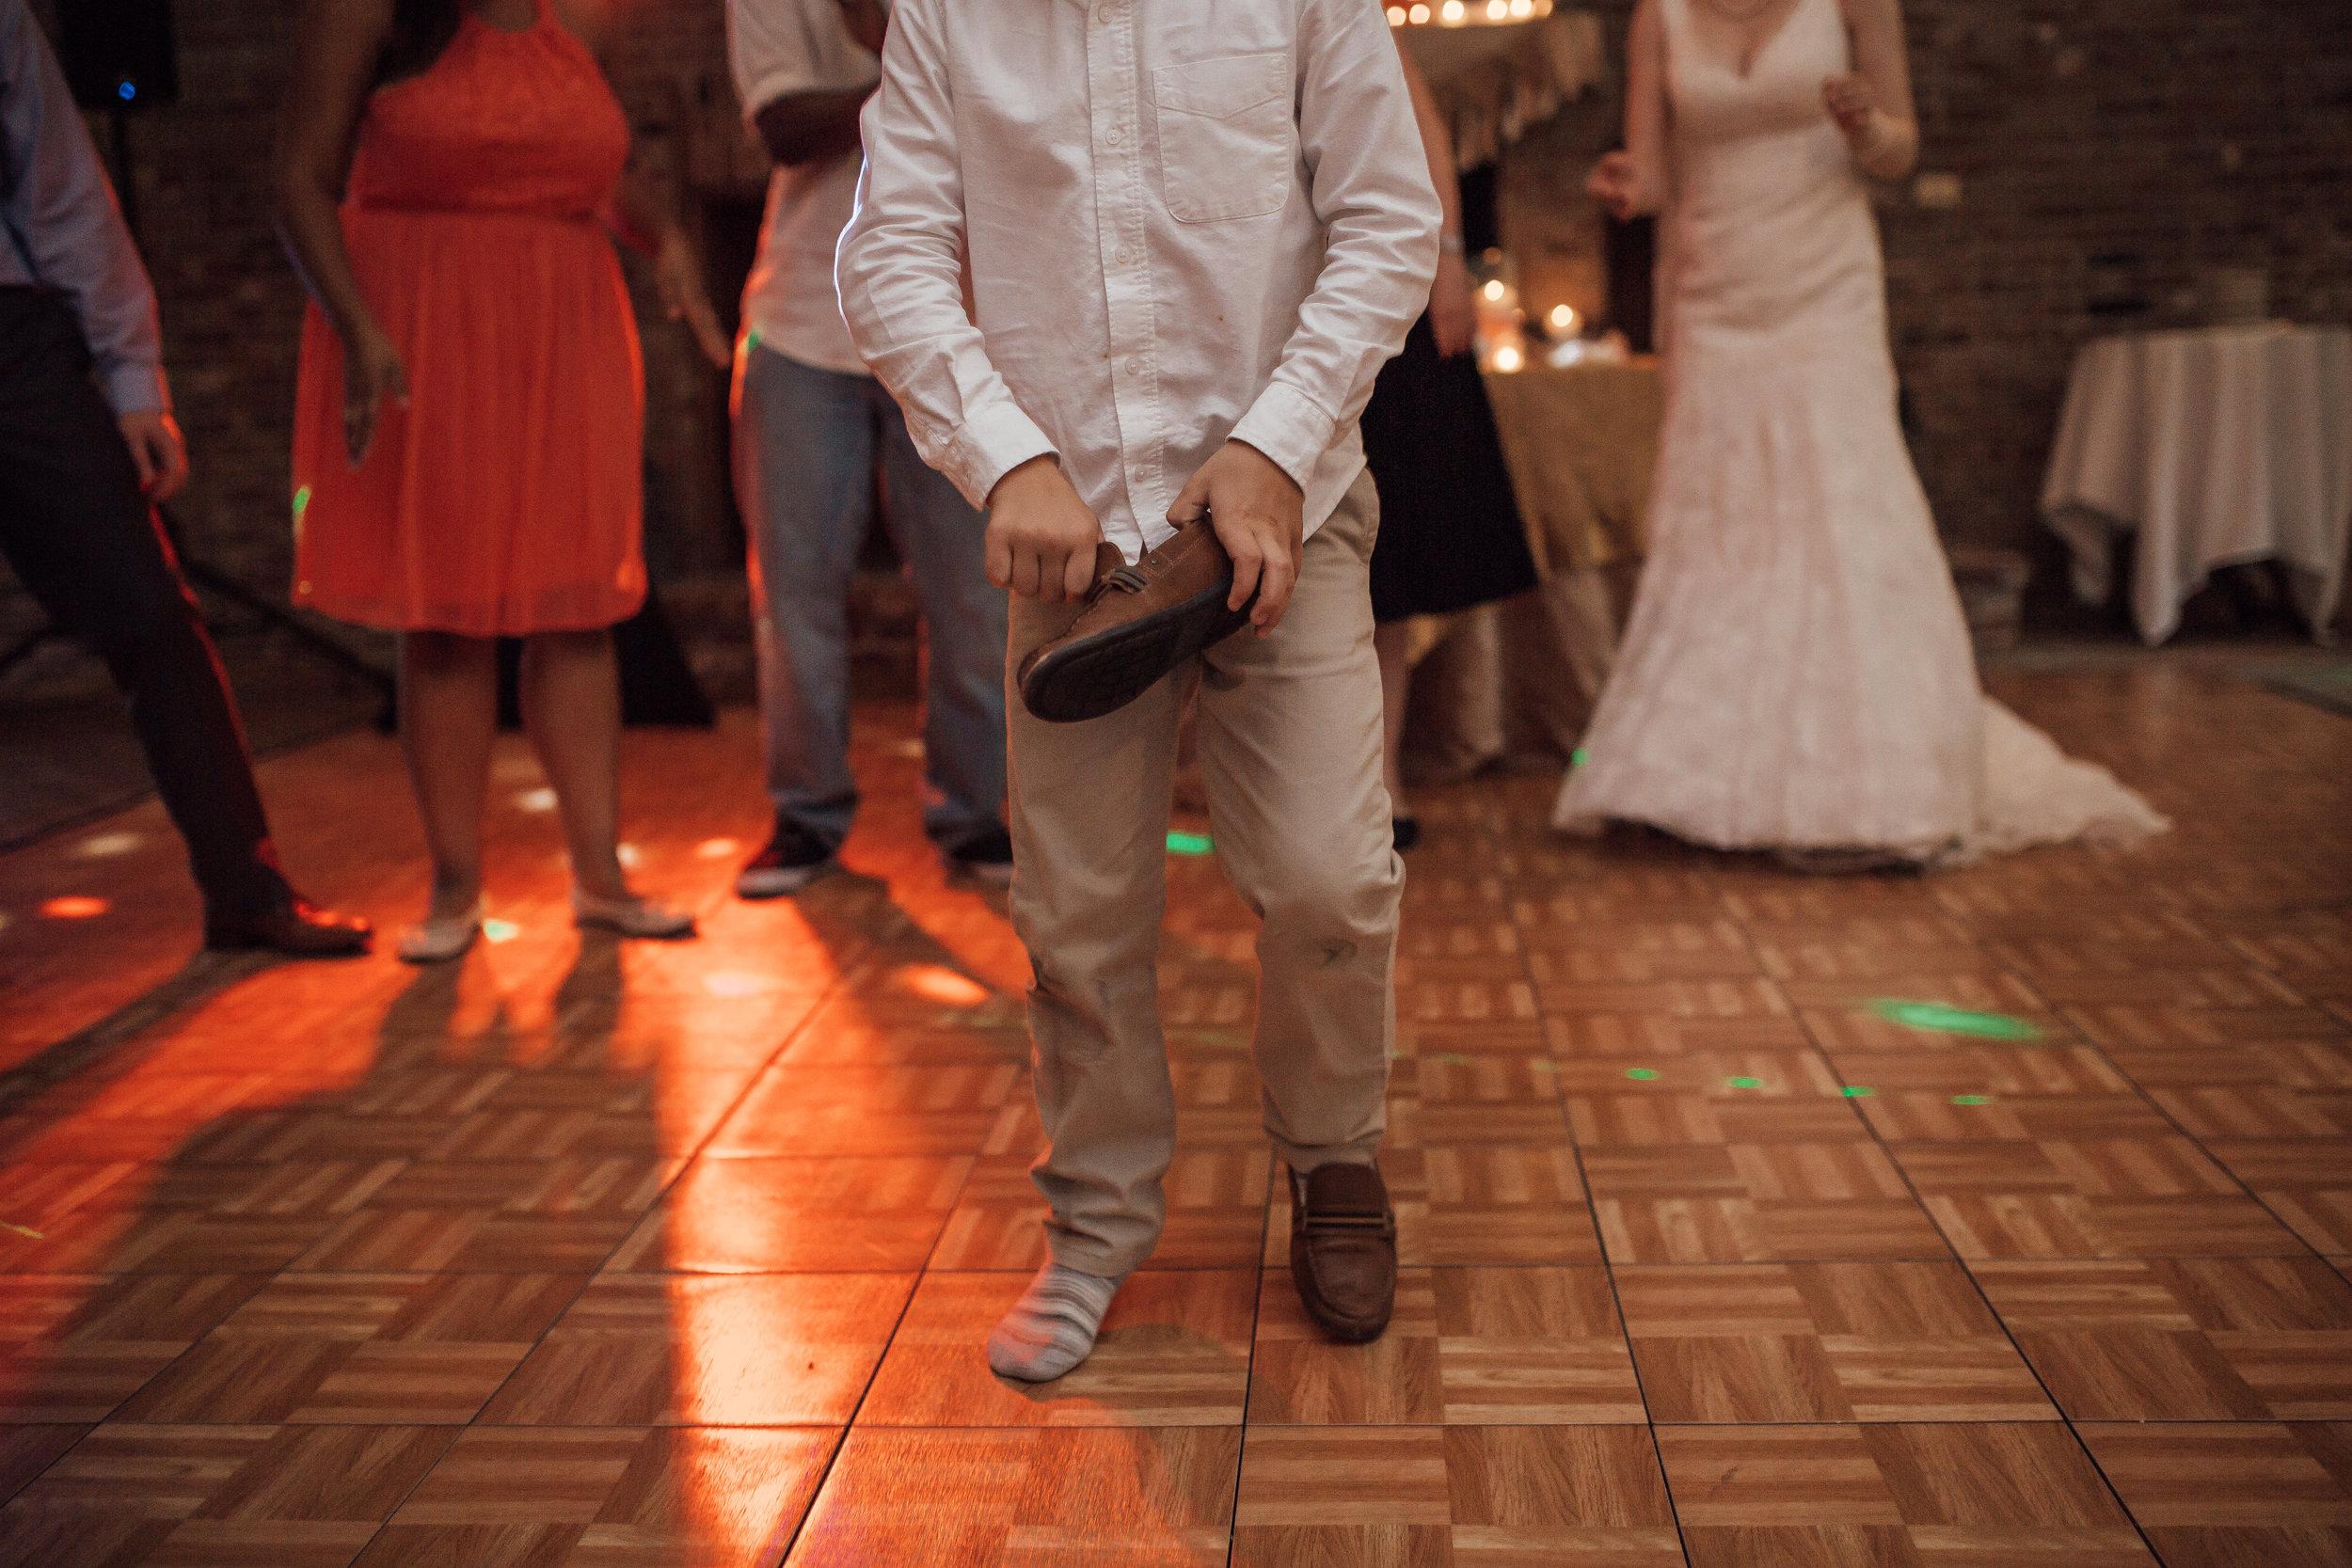 cassie-cook-photography-memphis-wedding-photographer-sonja-cody-wedding-568.jpg